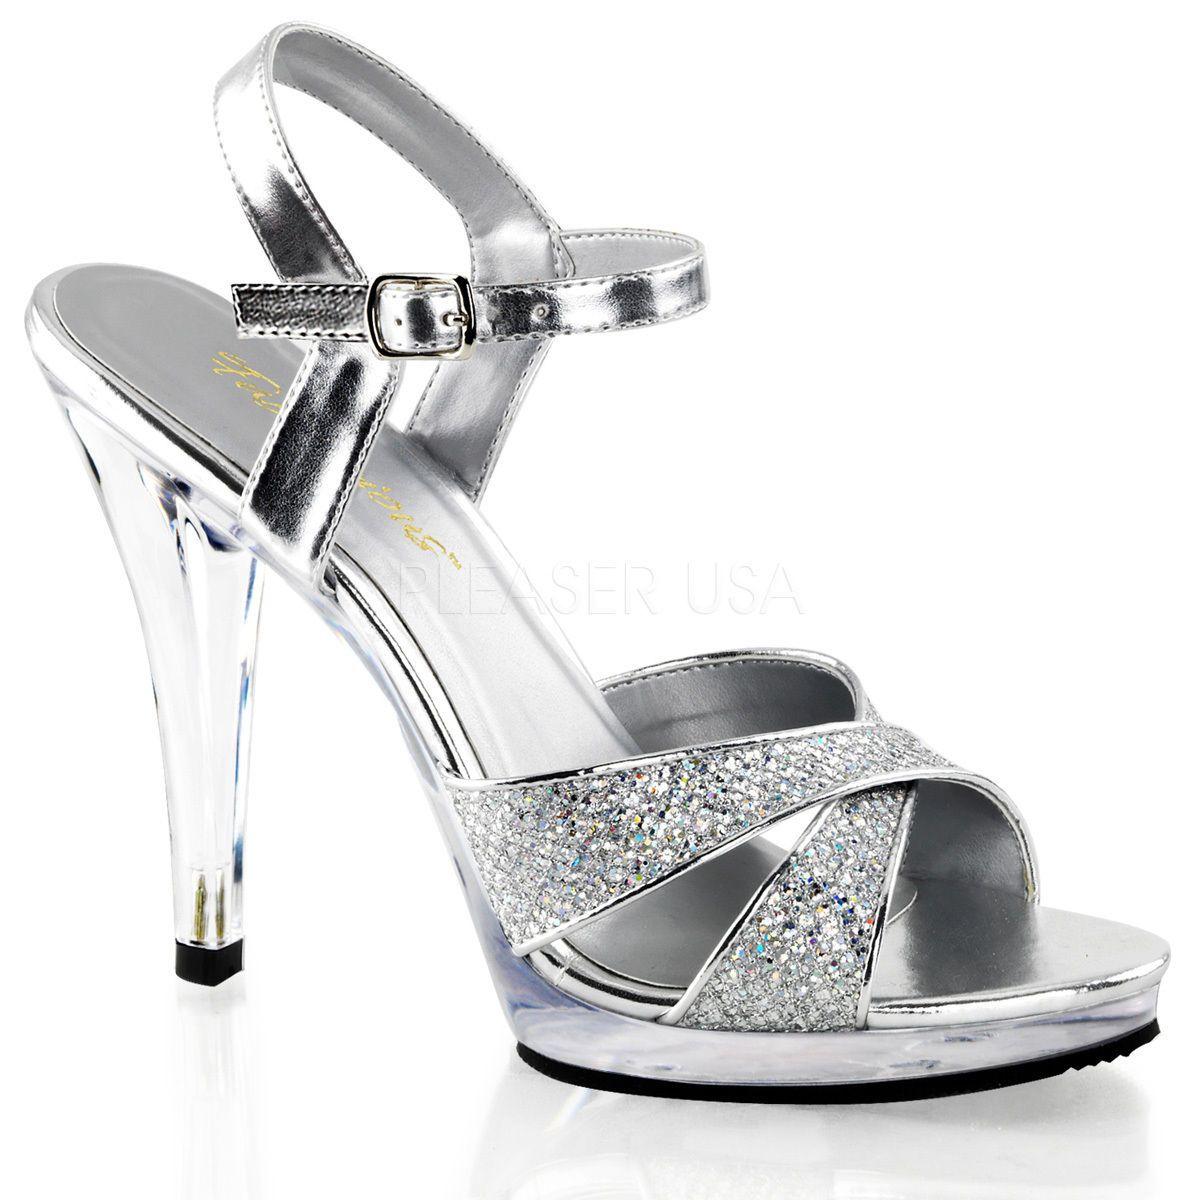 e1a915e9228c Silver Salsa Swing Dance Heels Drag Queen Crossdresser Shoes size 11 12 13  14